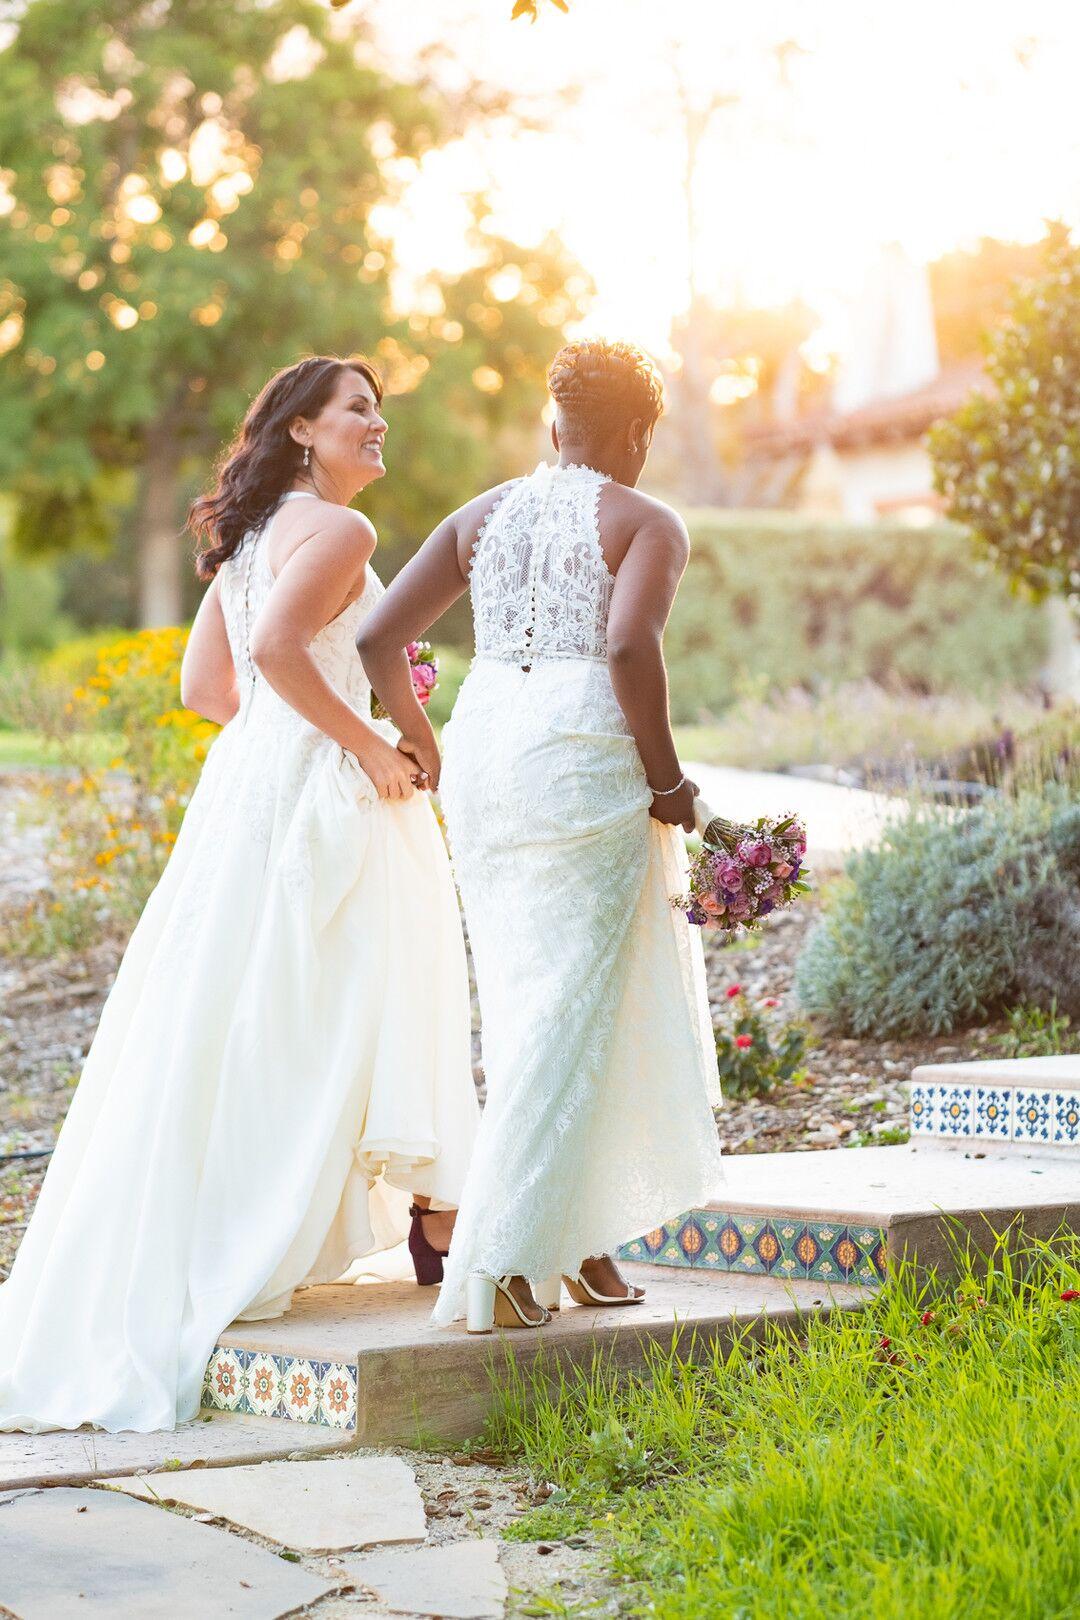 www.santabarbarawedding.com | Venue: The Casitas of Arroyo Grande | Photographer: Renoda Campbell Photography | Second Shooter: John Patrick Images |  Brides After Vows